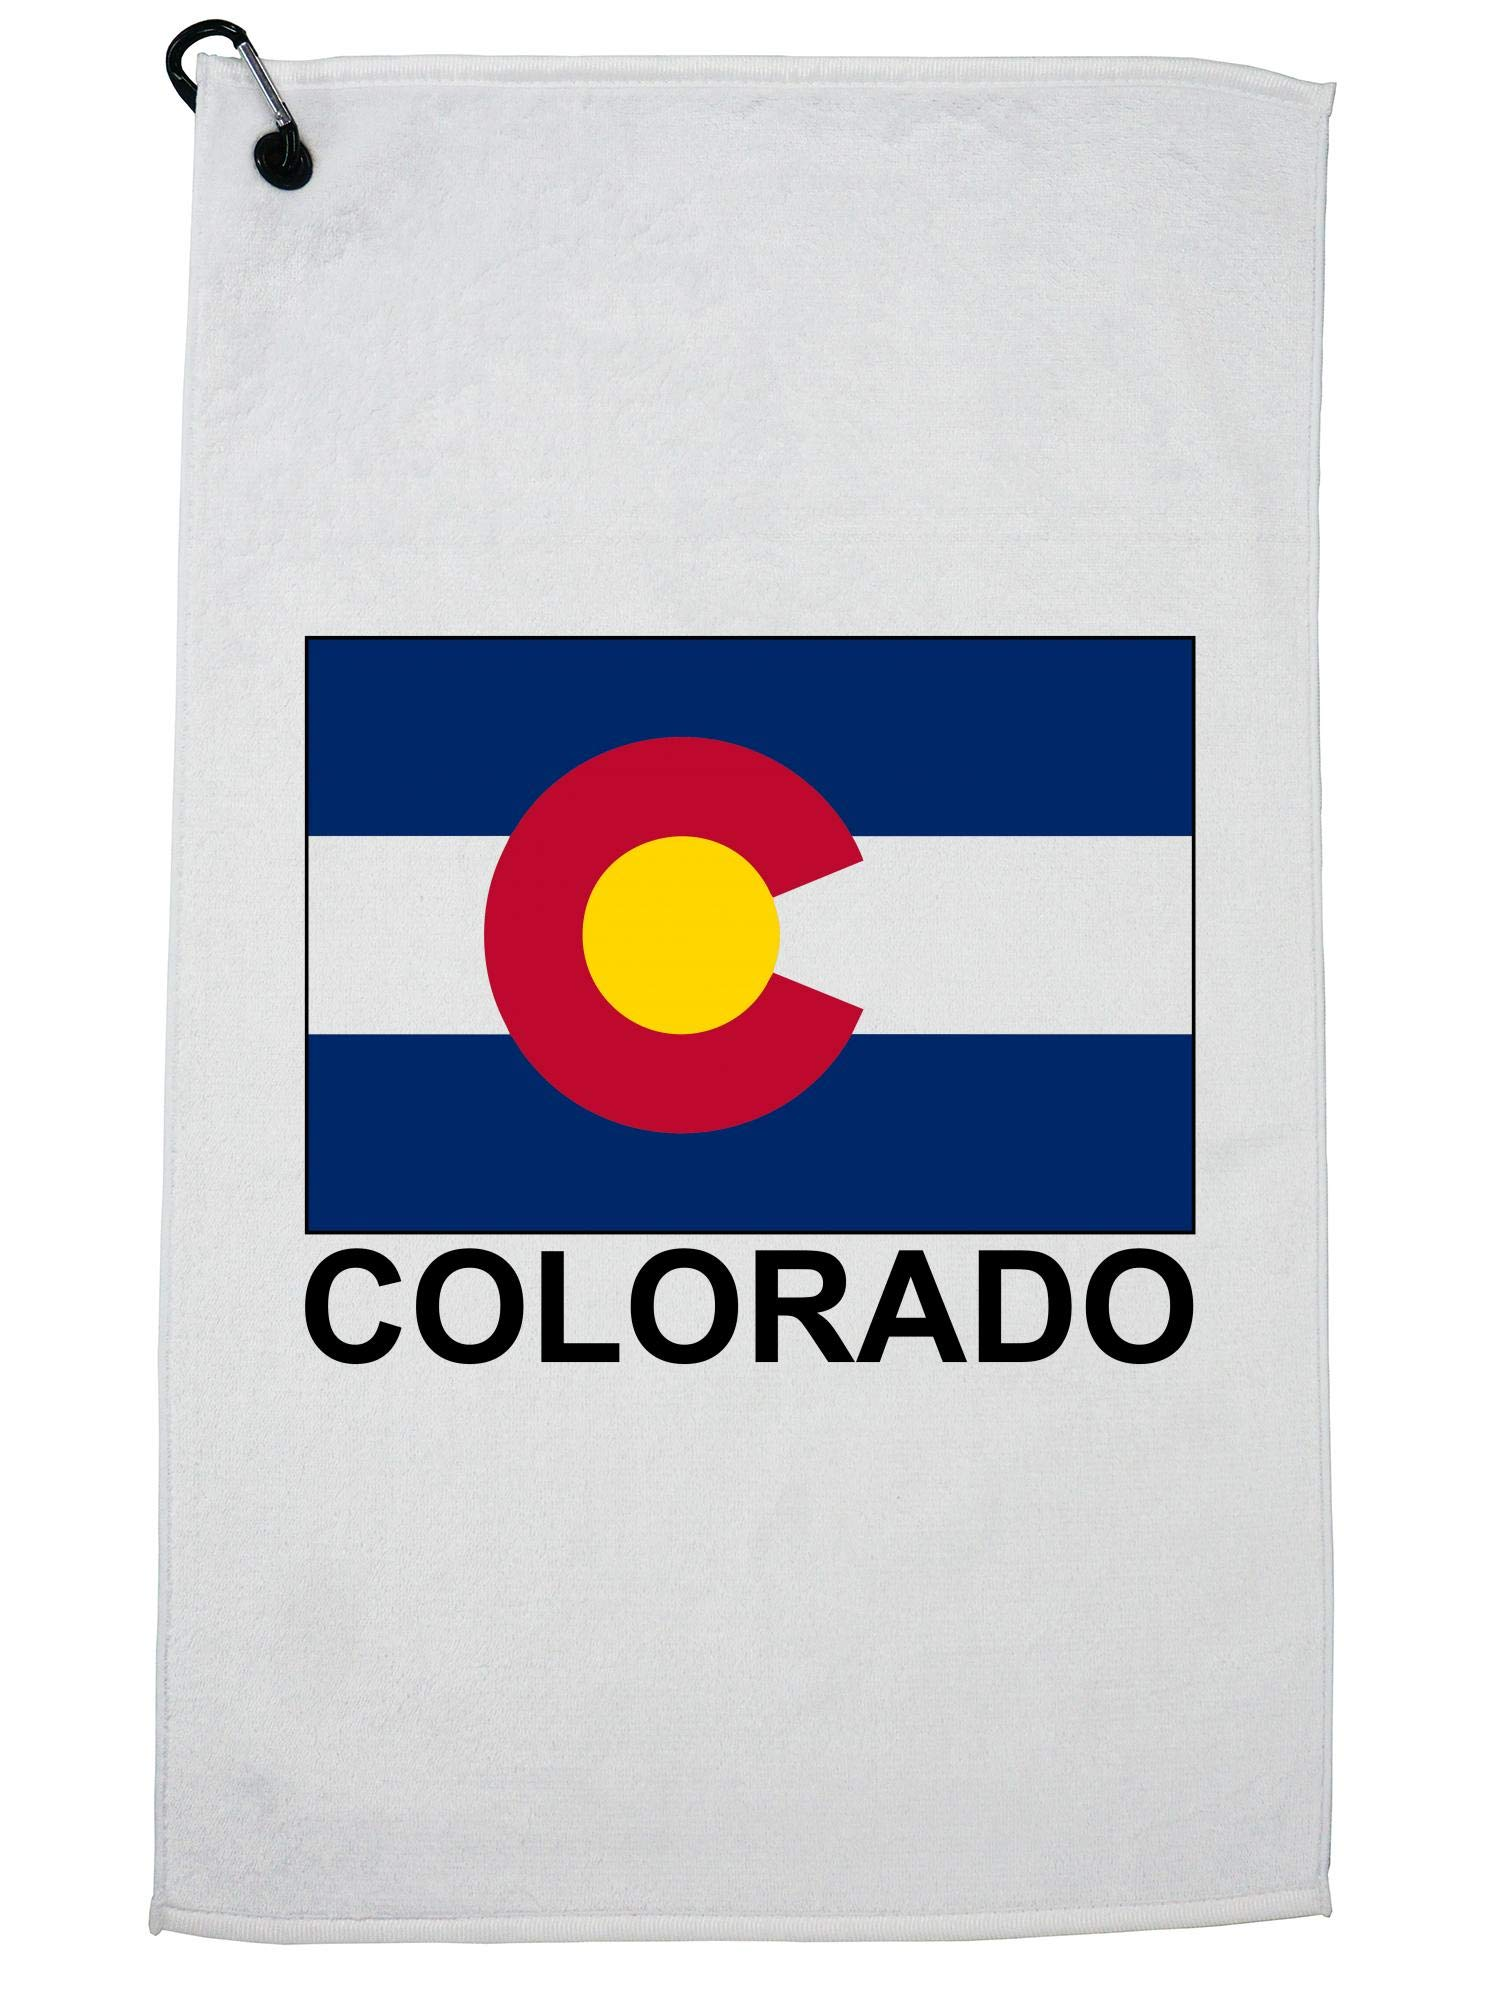 Hollywood Thread Colorado State Flag - Special Vintage Edition Golf Towel Carabiner Clip